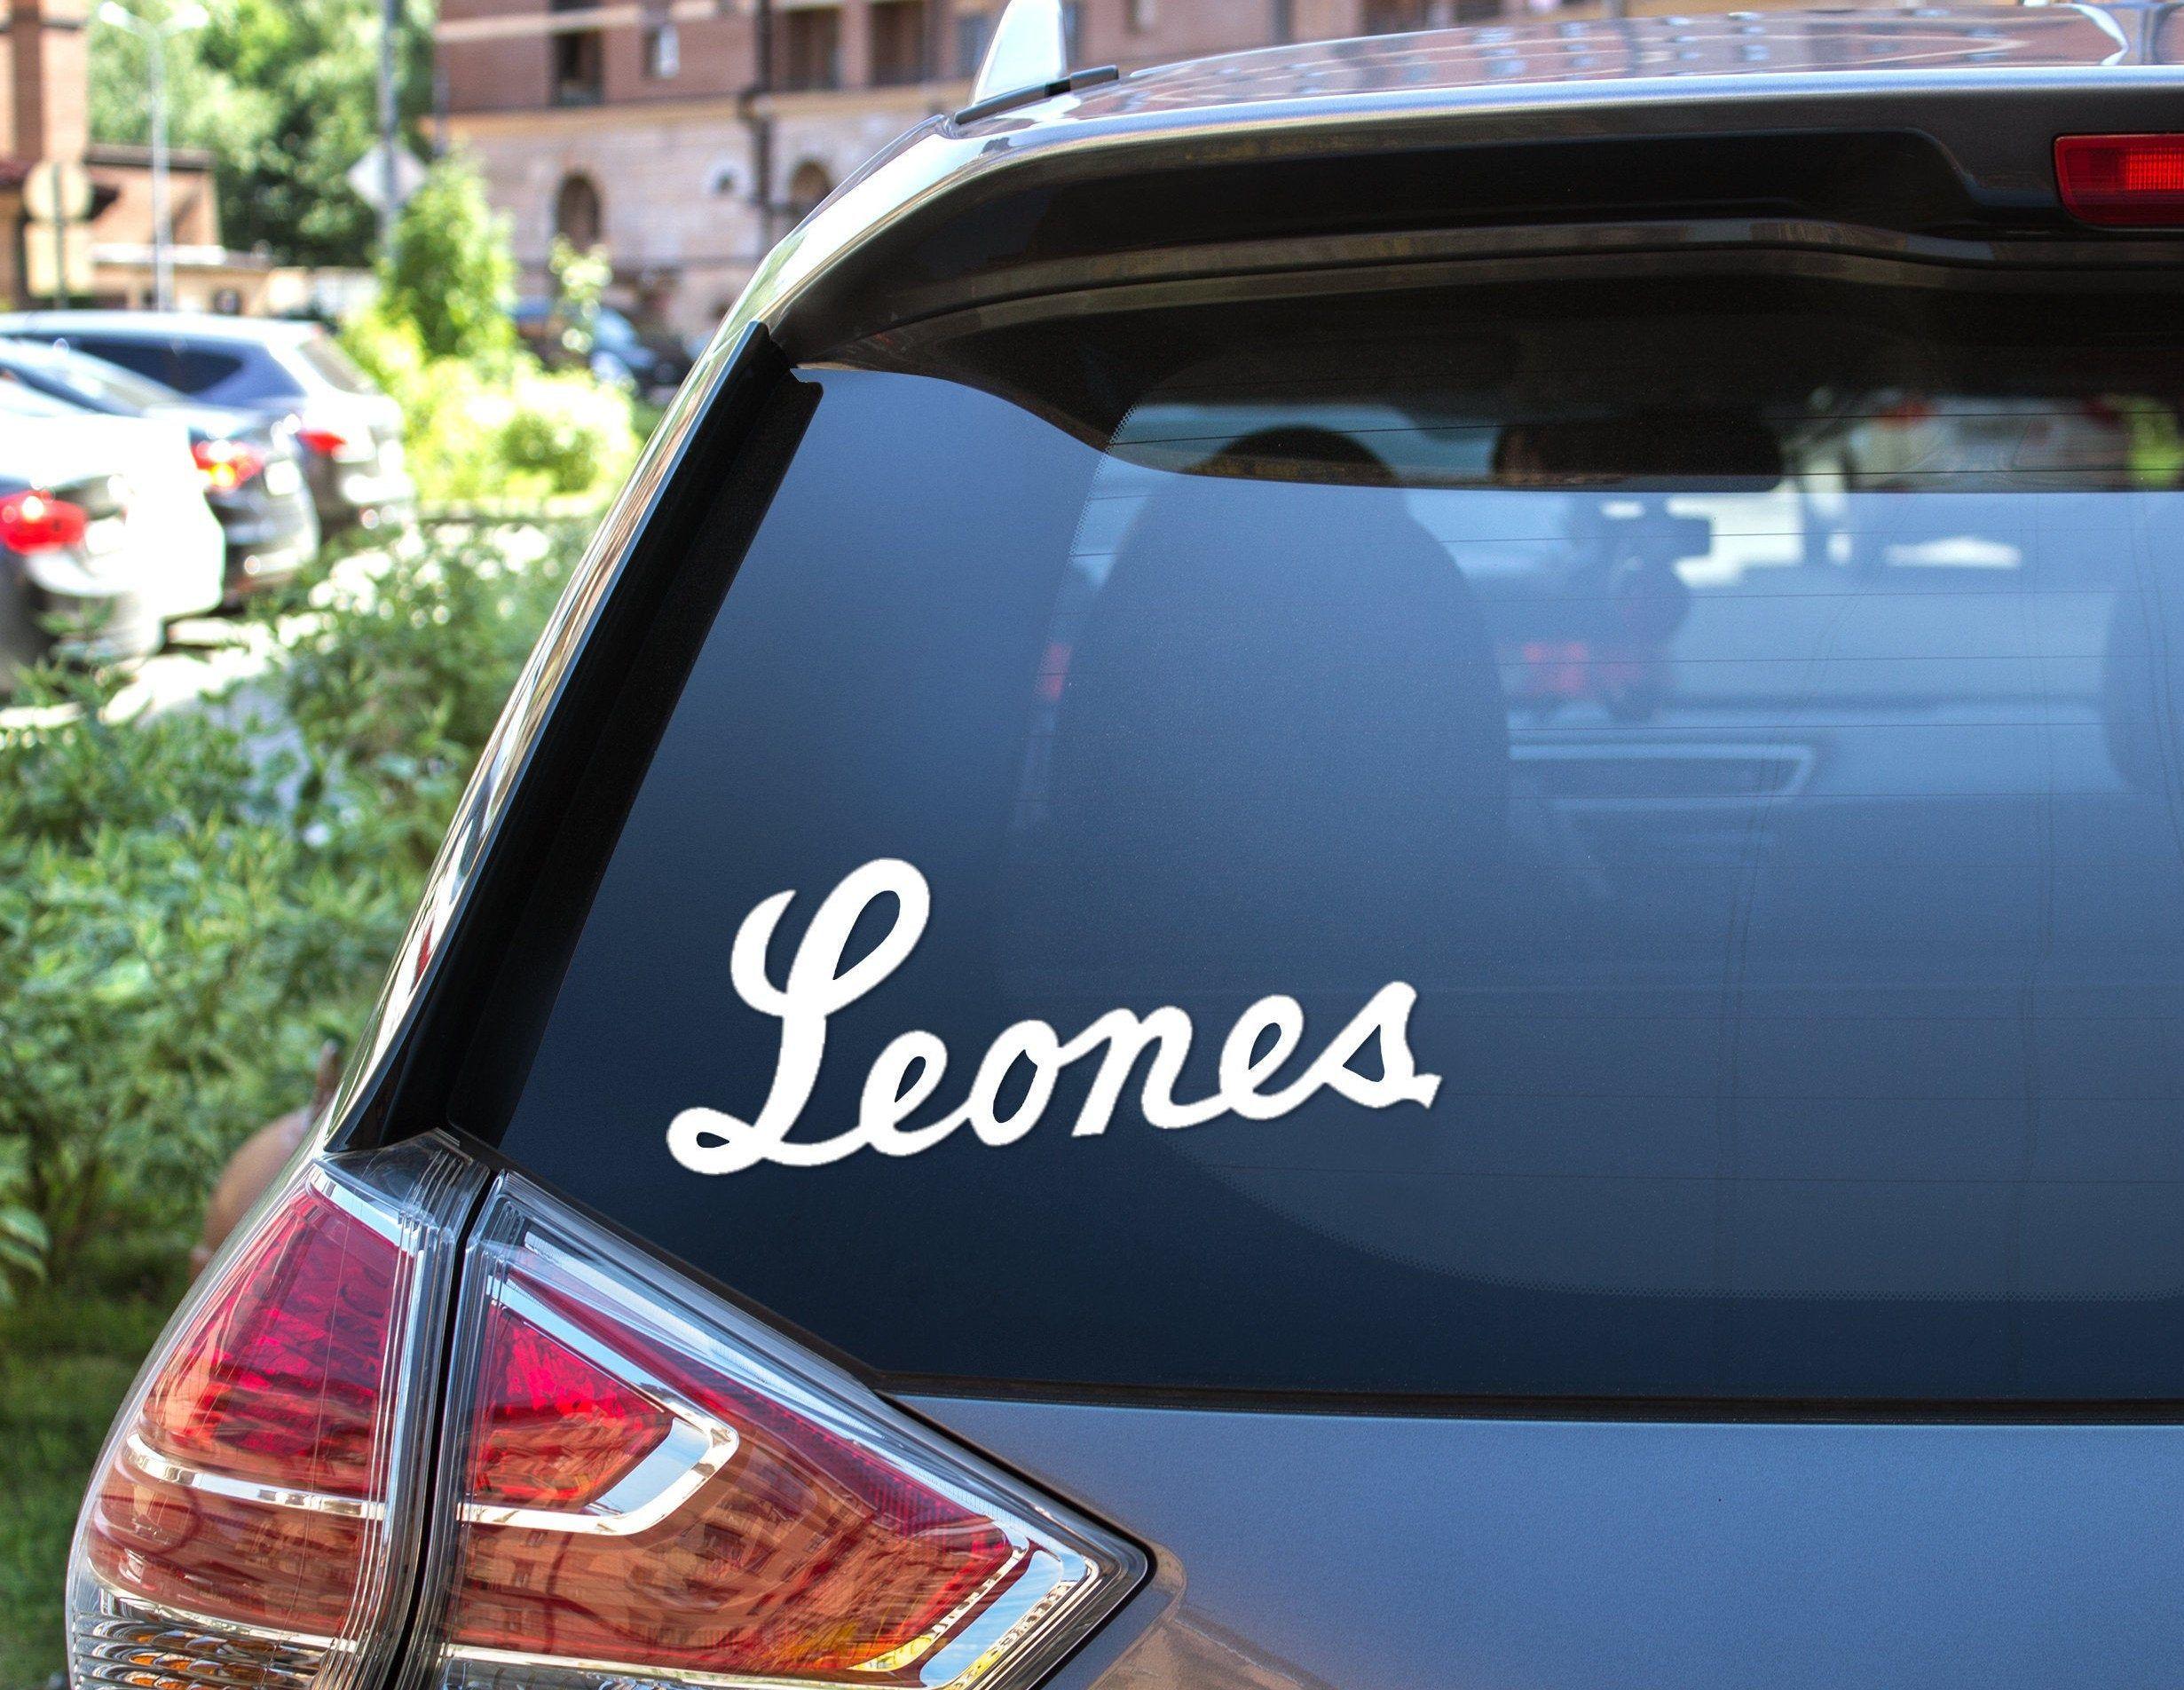 Leones Venezuela Decal Vinyl Sticker For Car Laptop And Windows Paomonkey S Cust Christian Car Decals Window Stickers Cute Car Decals Christian Car Decals [ 1904 x 2461 Pixel ]